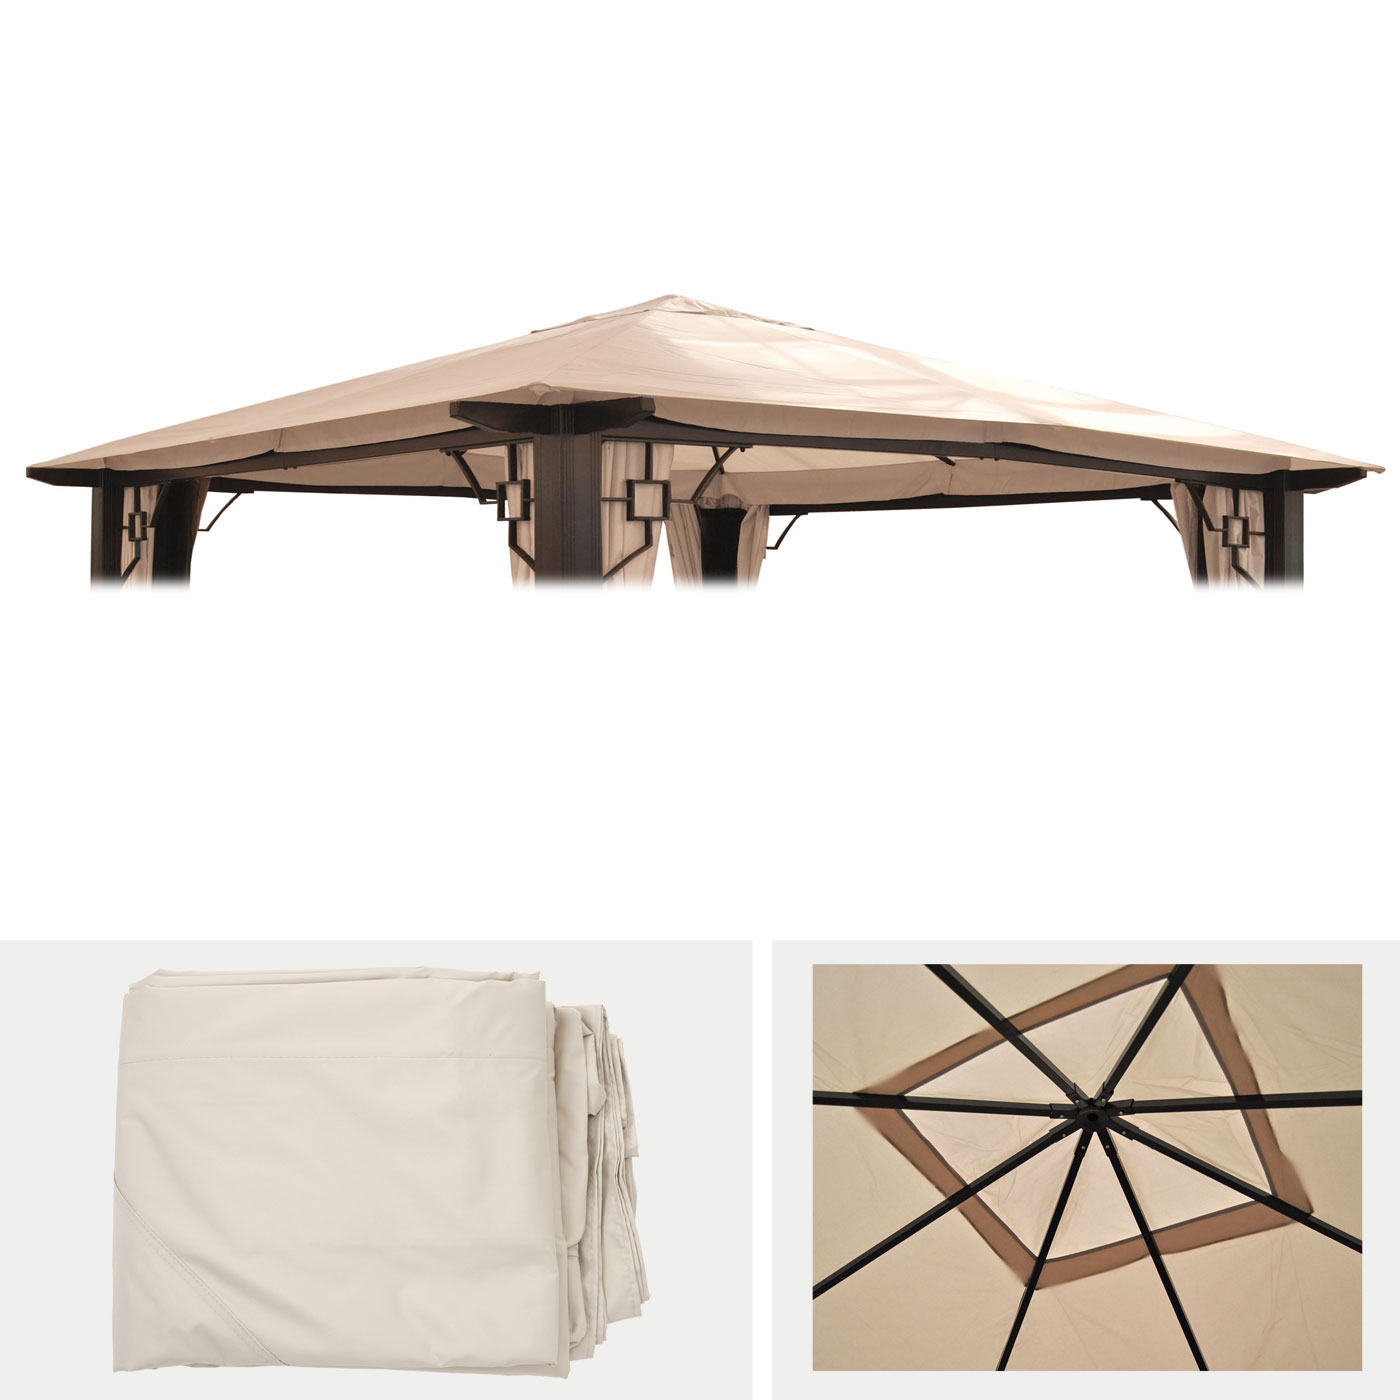 ersatzbezug f r dach pergola pavillon mira 3 5x3 5m creme. Black Bedroom Furniture Sets. Home Design Ideas